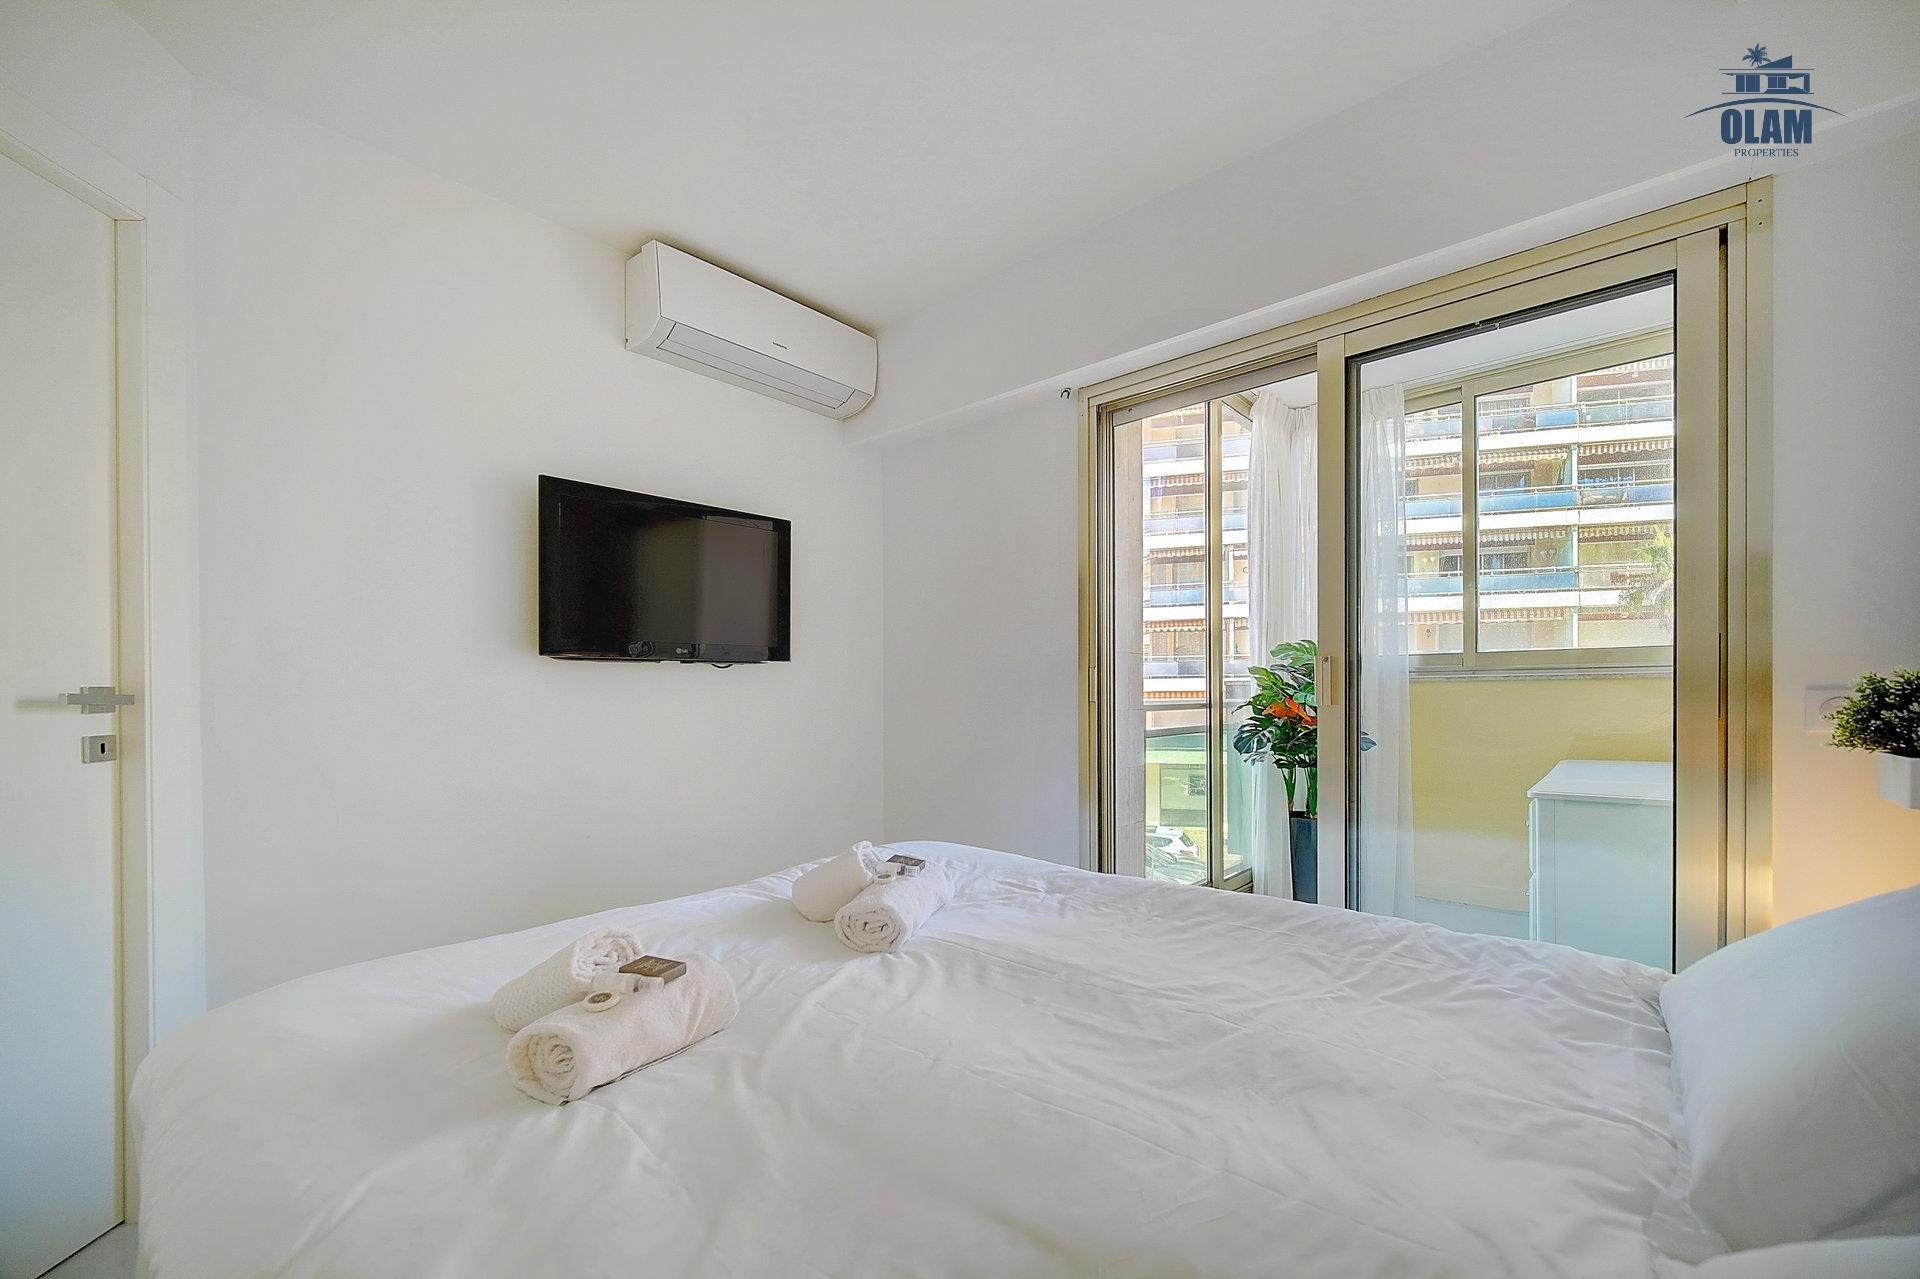 Bedroom, Cannes, Croisette, French Riviera, seasonal rental